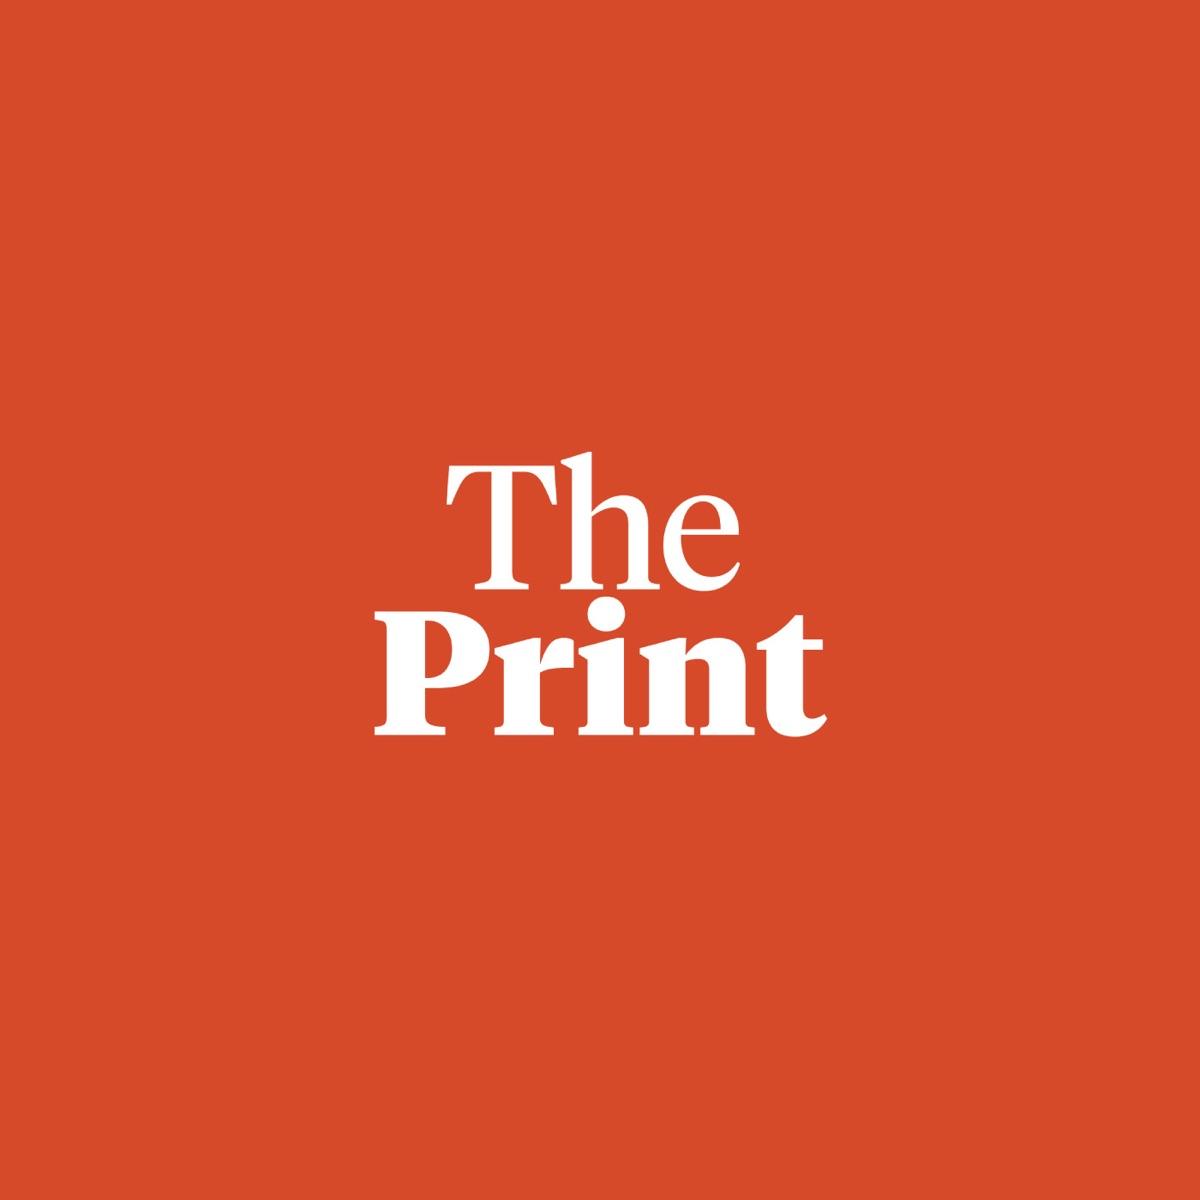 ThePrint